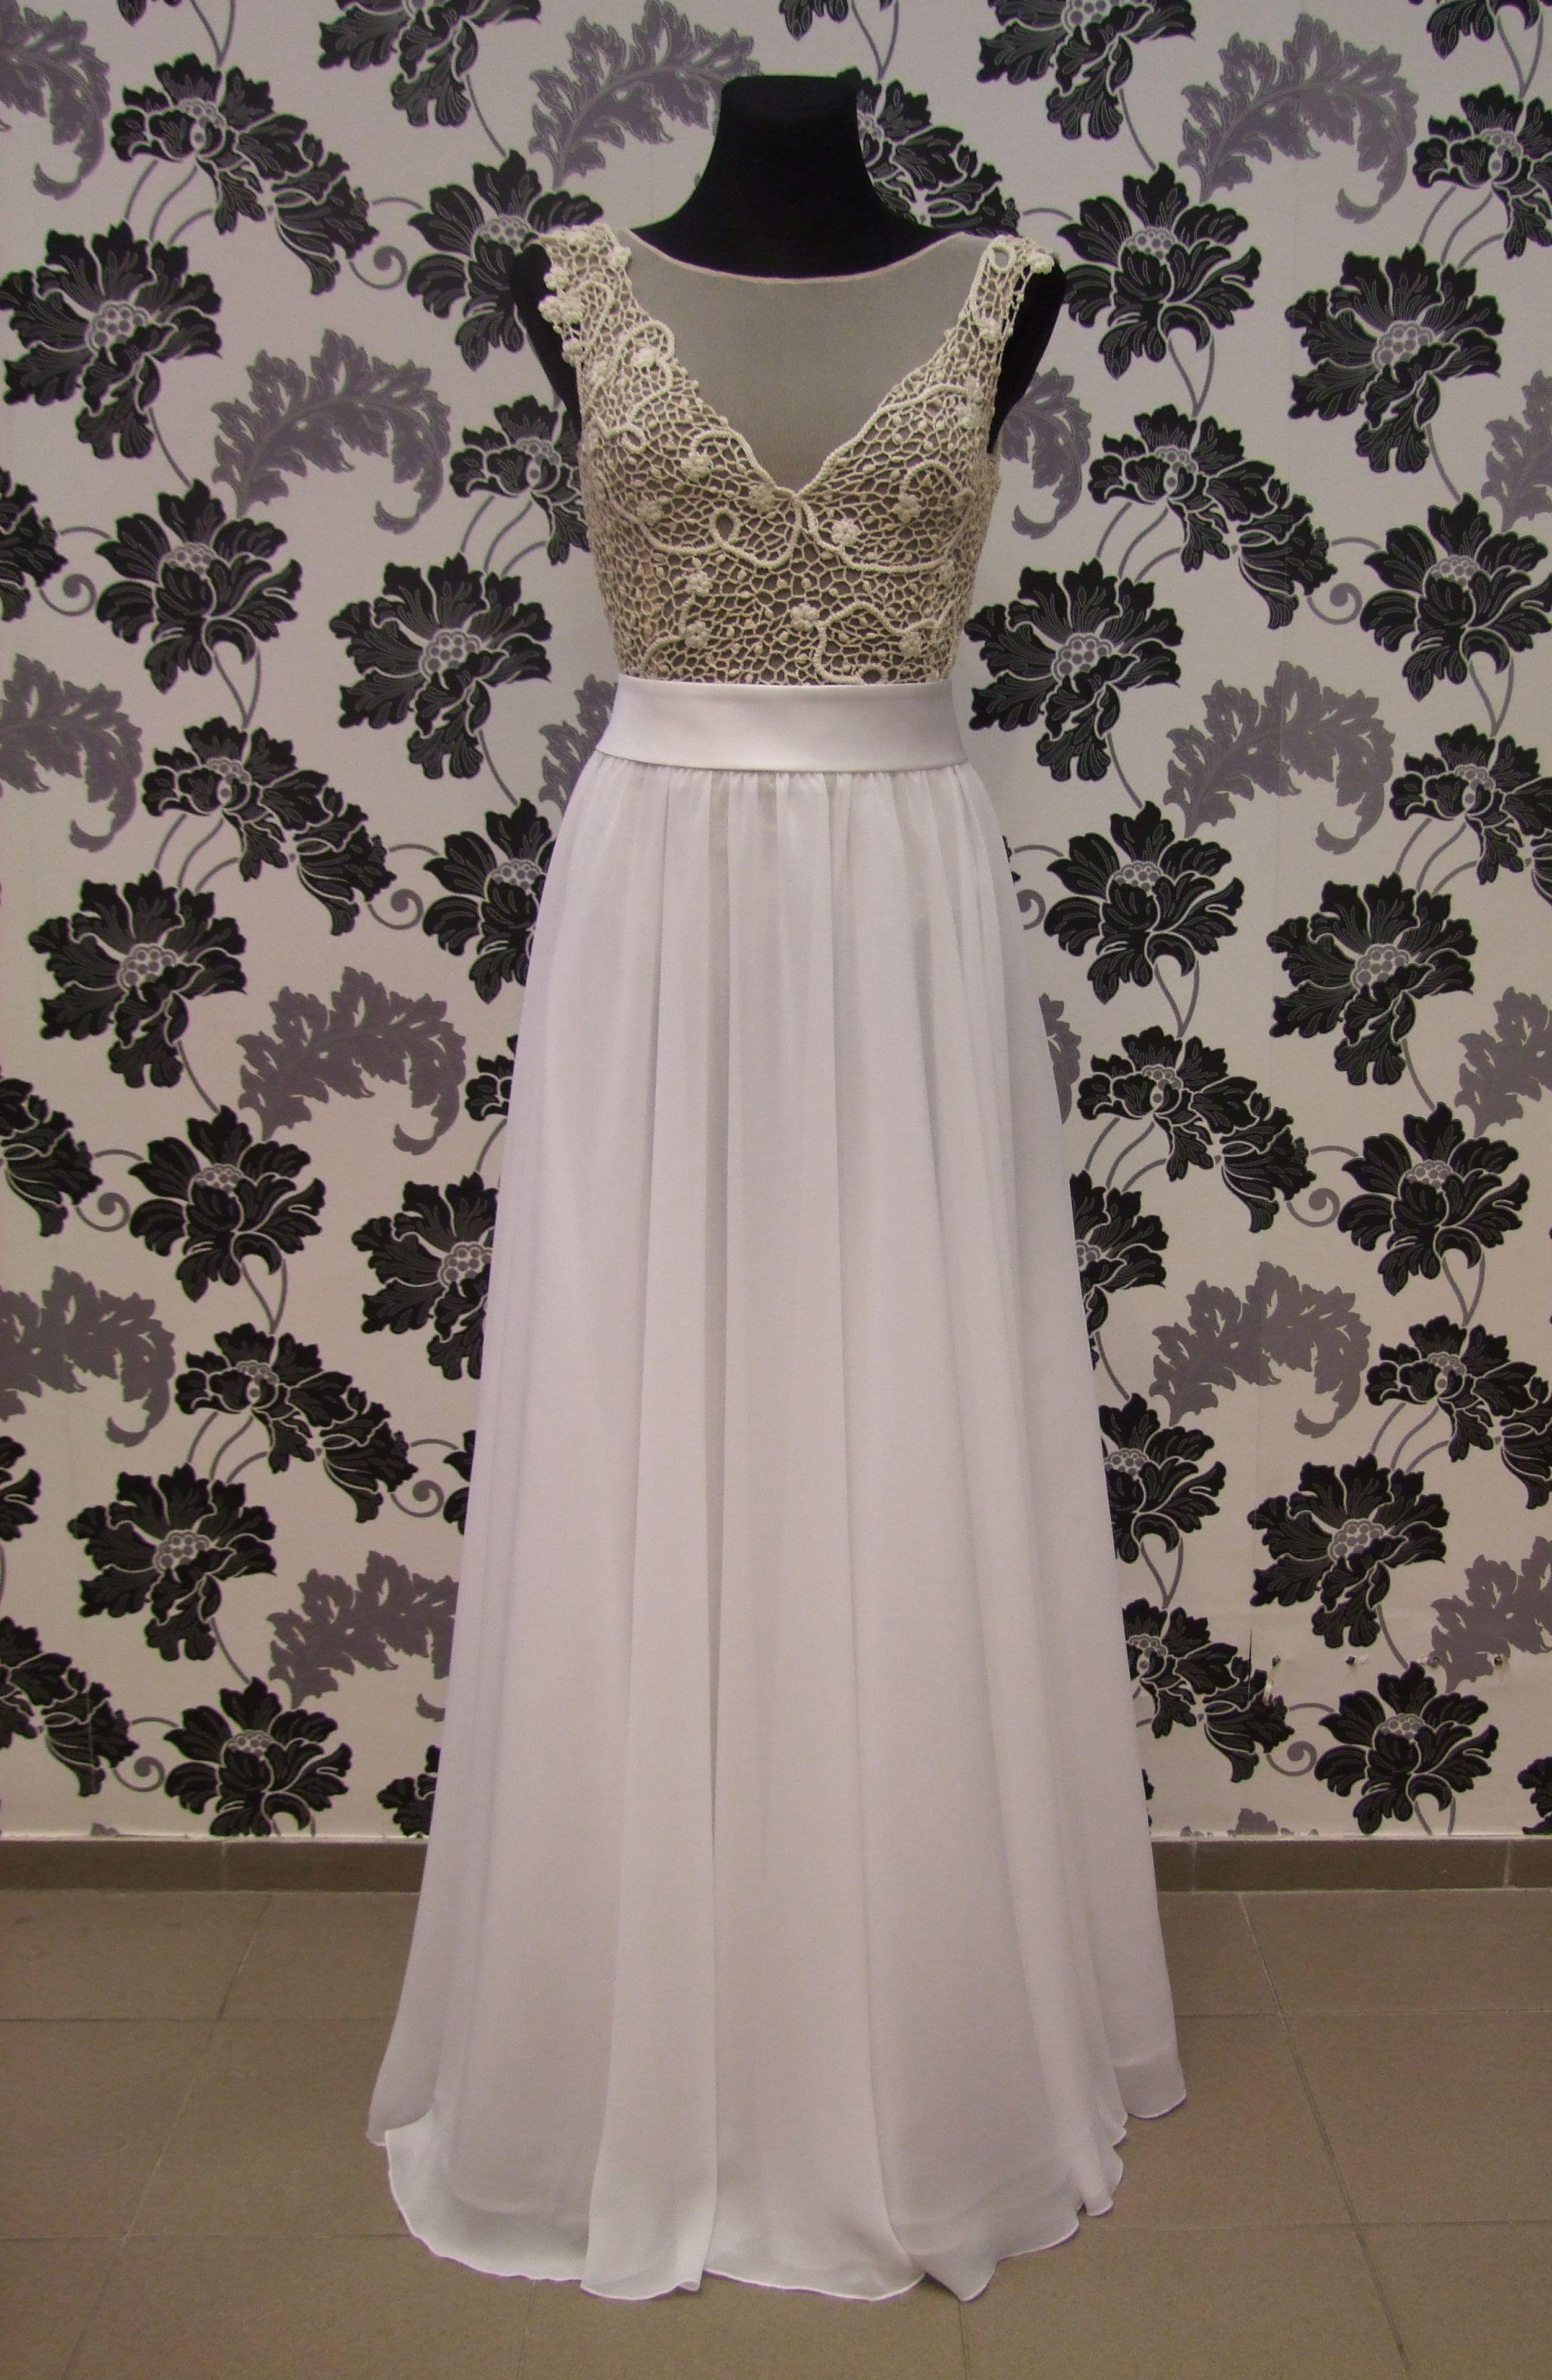 Unique irish crochet wedding dress Crochet wedding